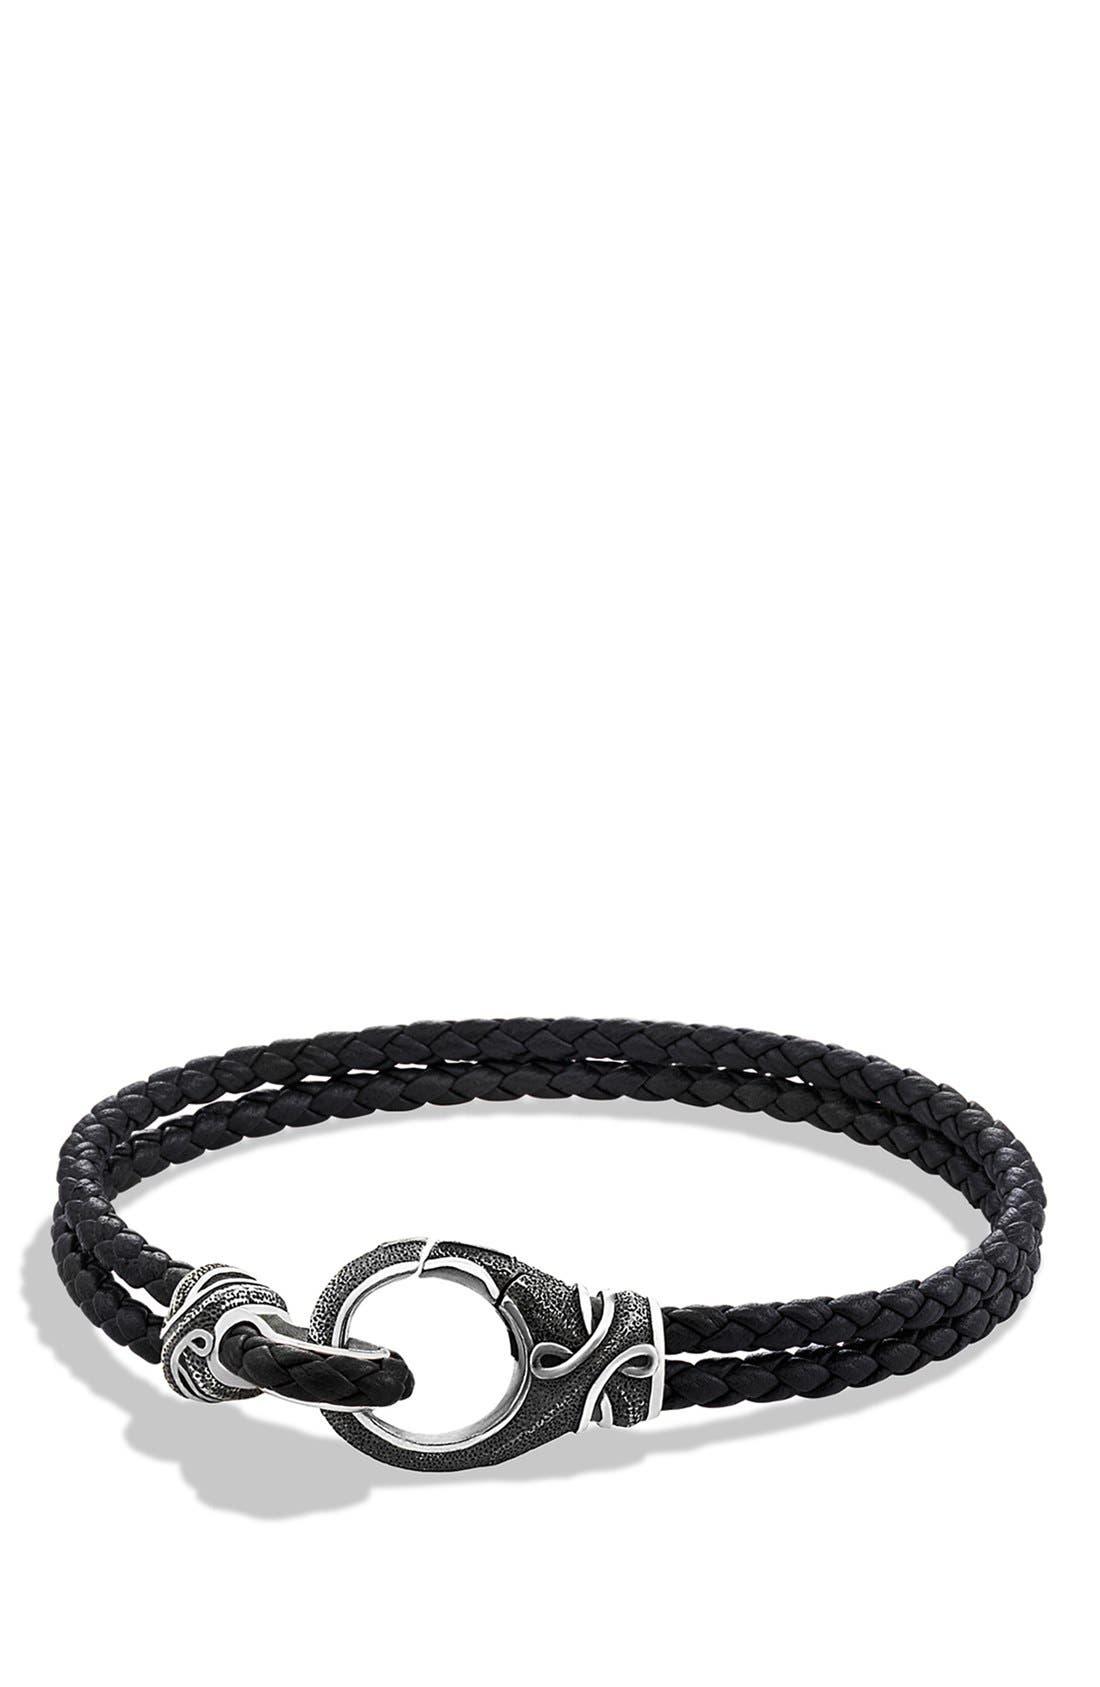 Alternate Image 1 Selected - David Yurman 'Armory' Two-Row Bracelet